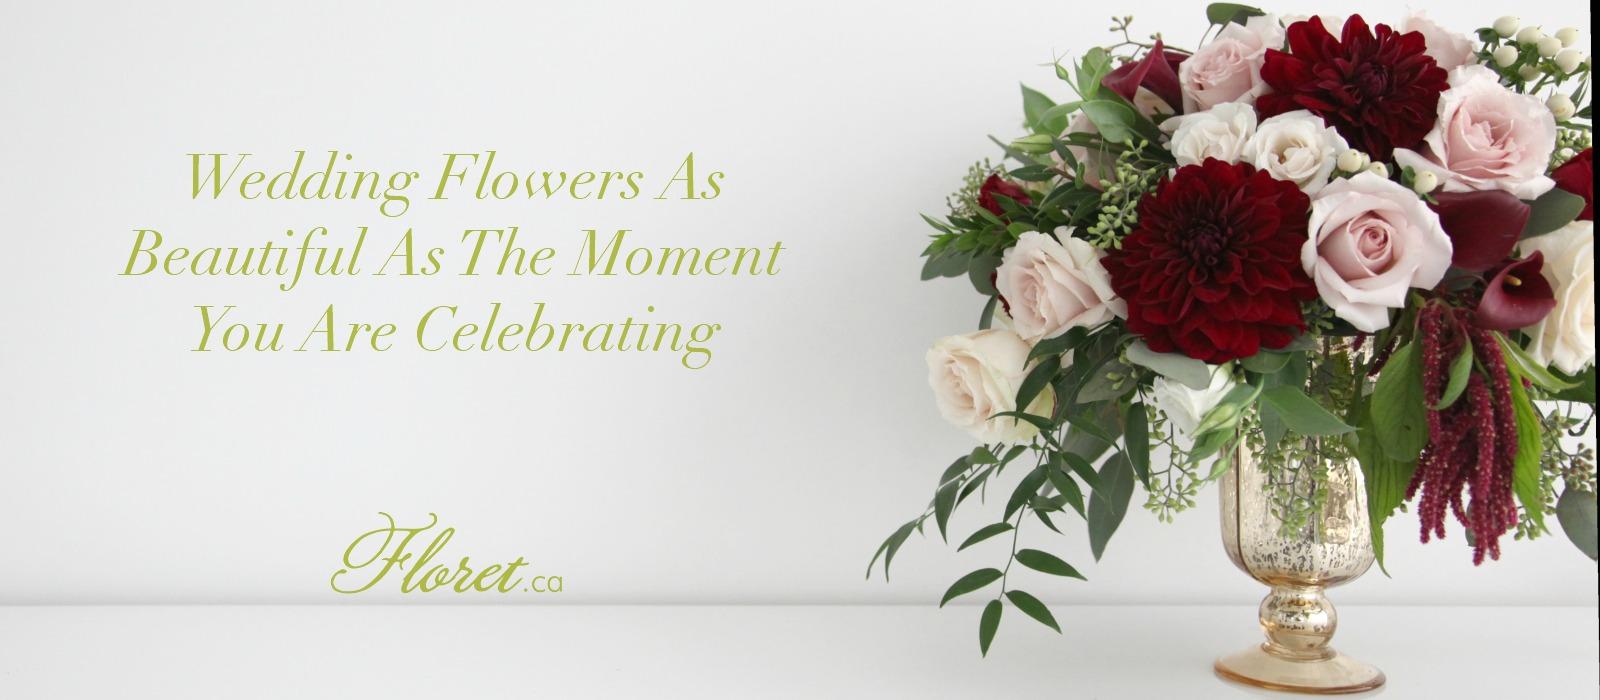 Wedding flowers in toronto wedding florist toronto welcome to floret for your wedding flowers in toronto izmirmasajfo